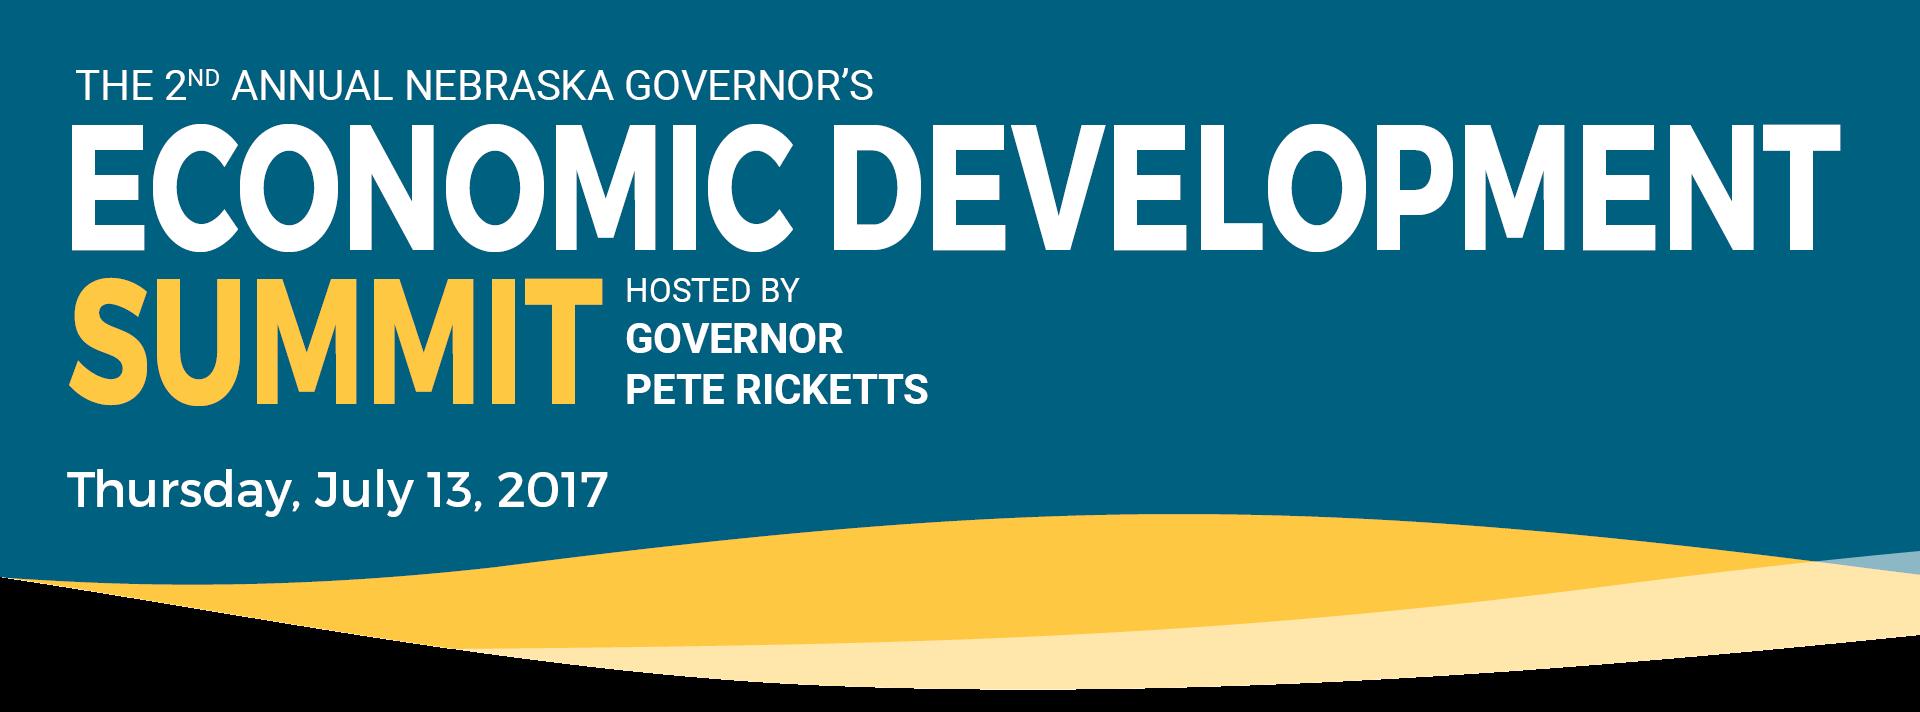 Quetica President, Rick Langer, Speaks at Nebraska's 2nd Annual Governor's Summit on Economic Development